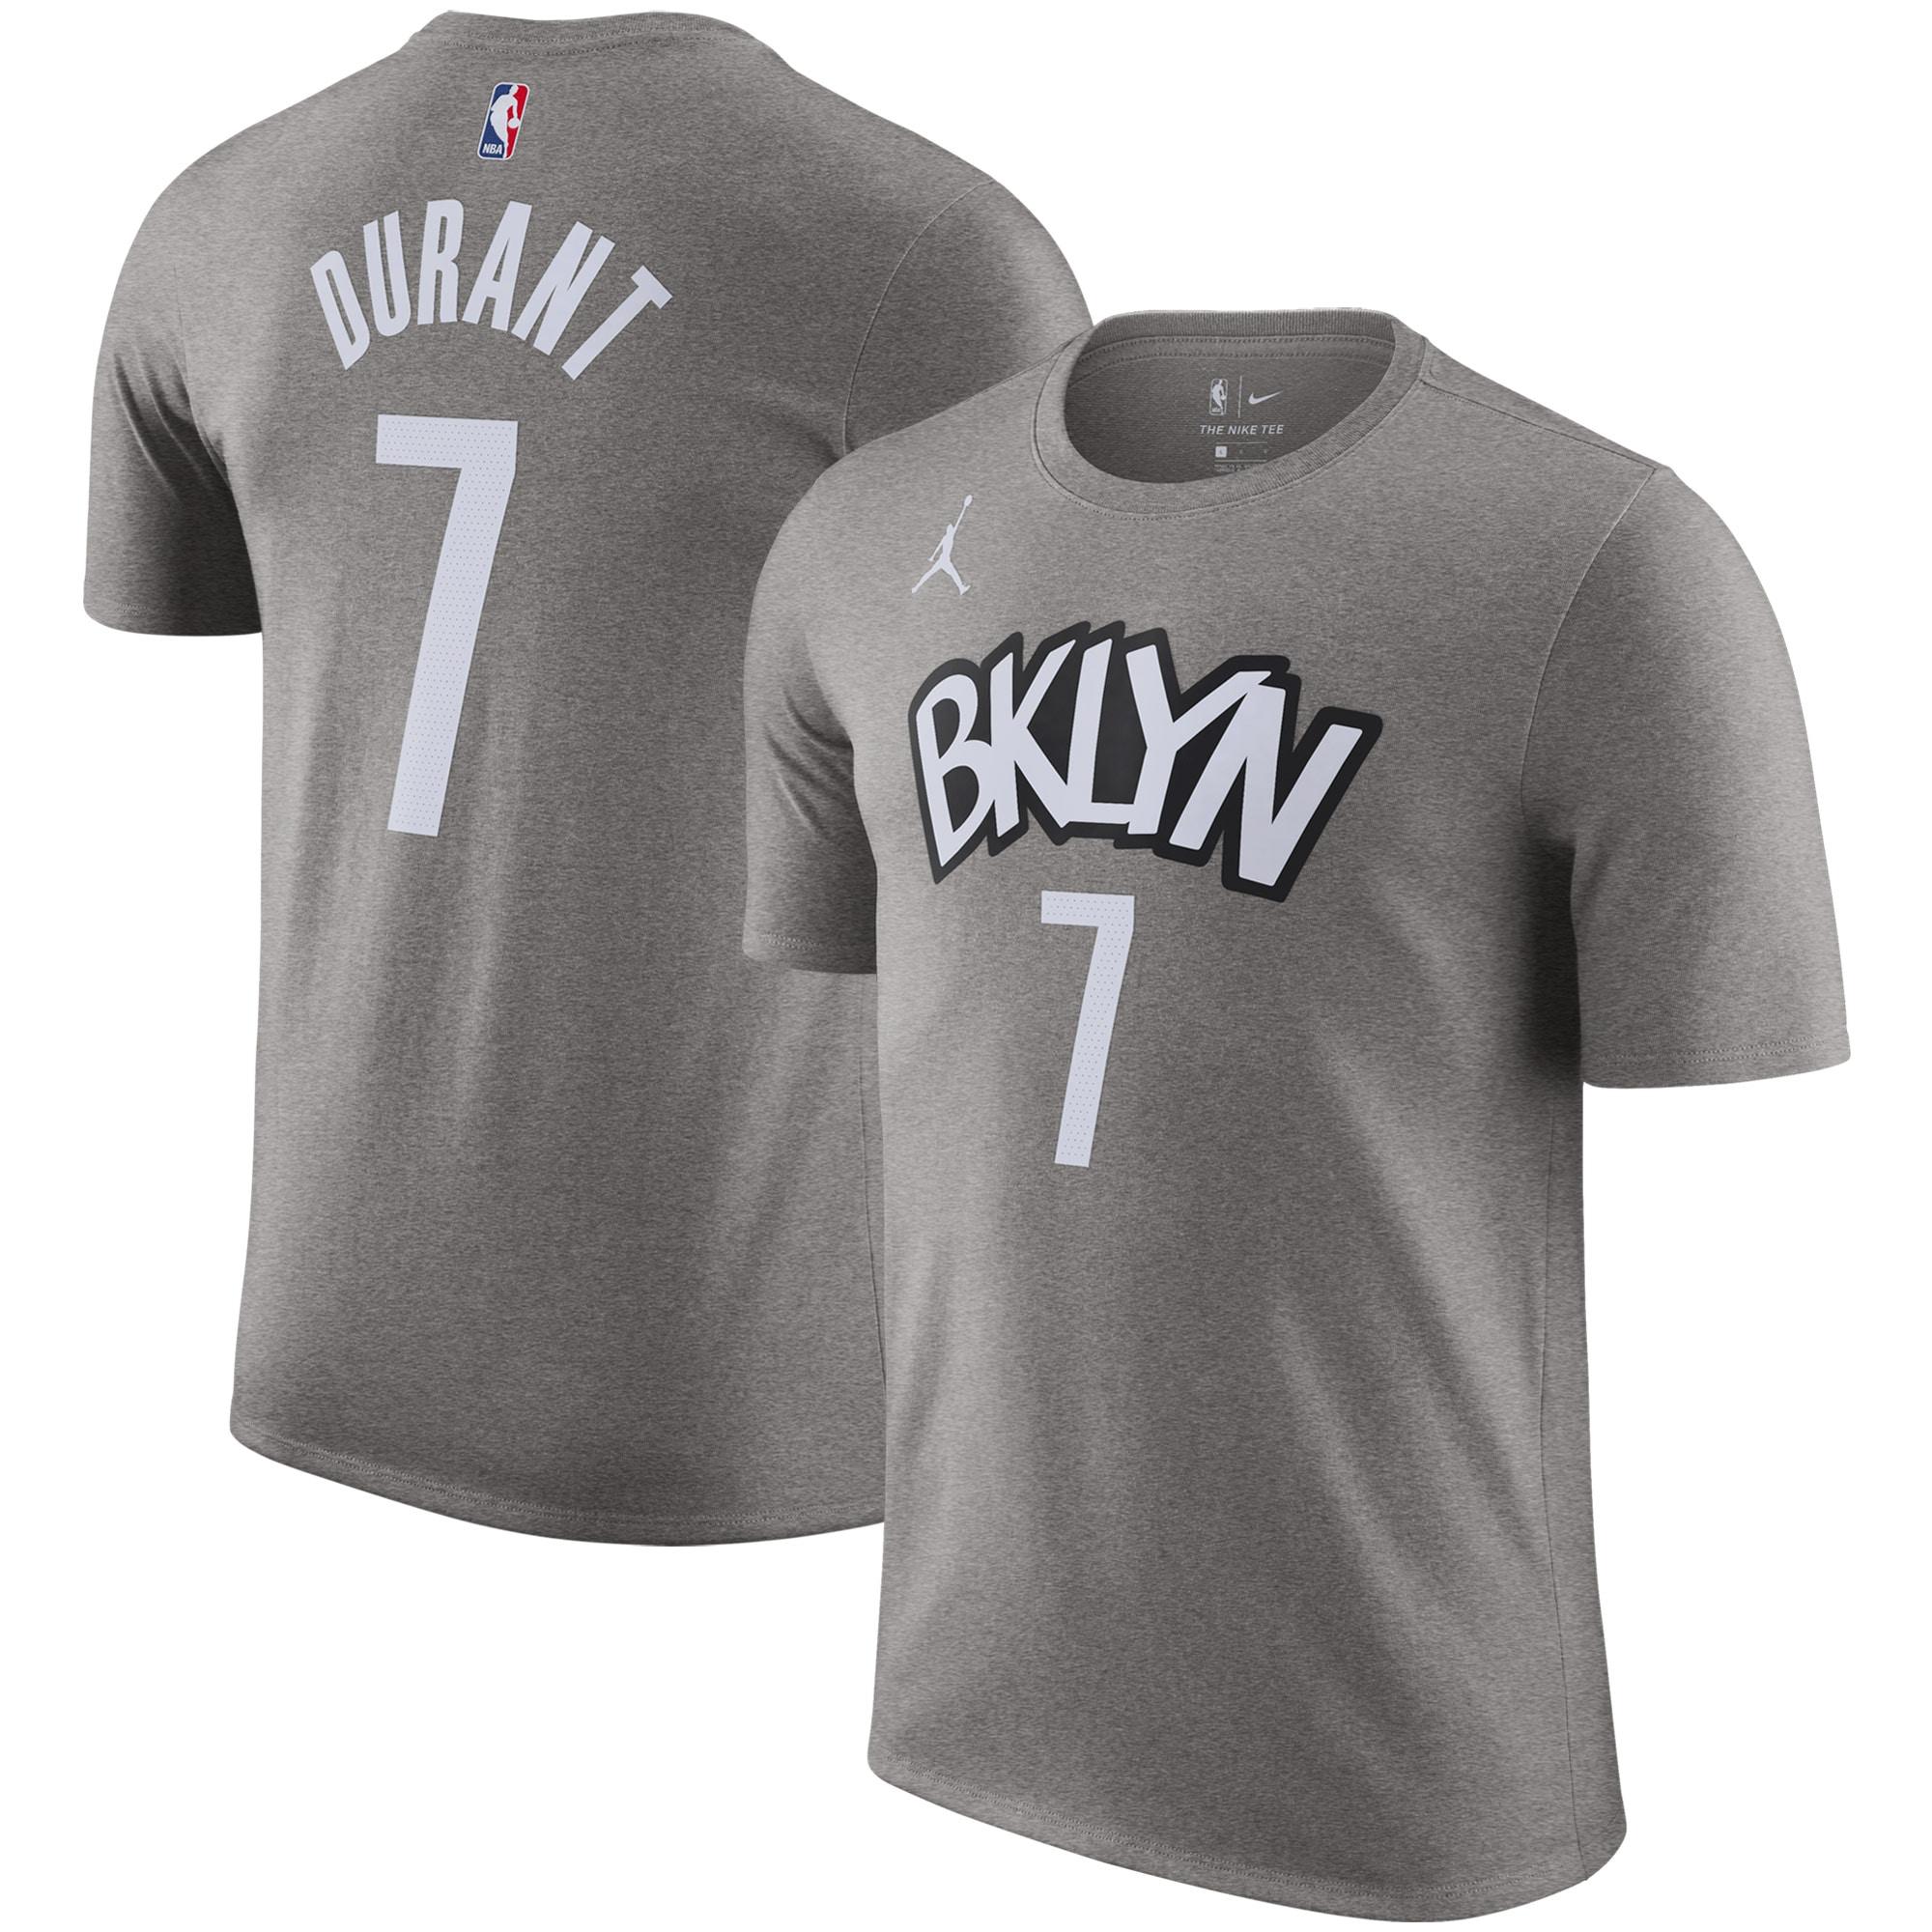 Brooklyn Nets Jordan Brand 2020/21 Kevin Durant Statement Name & Number T-Shirt - Gray